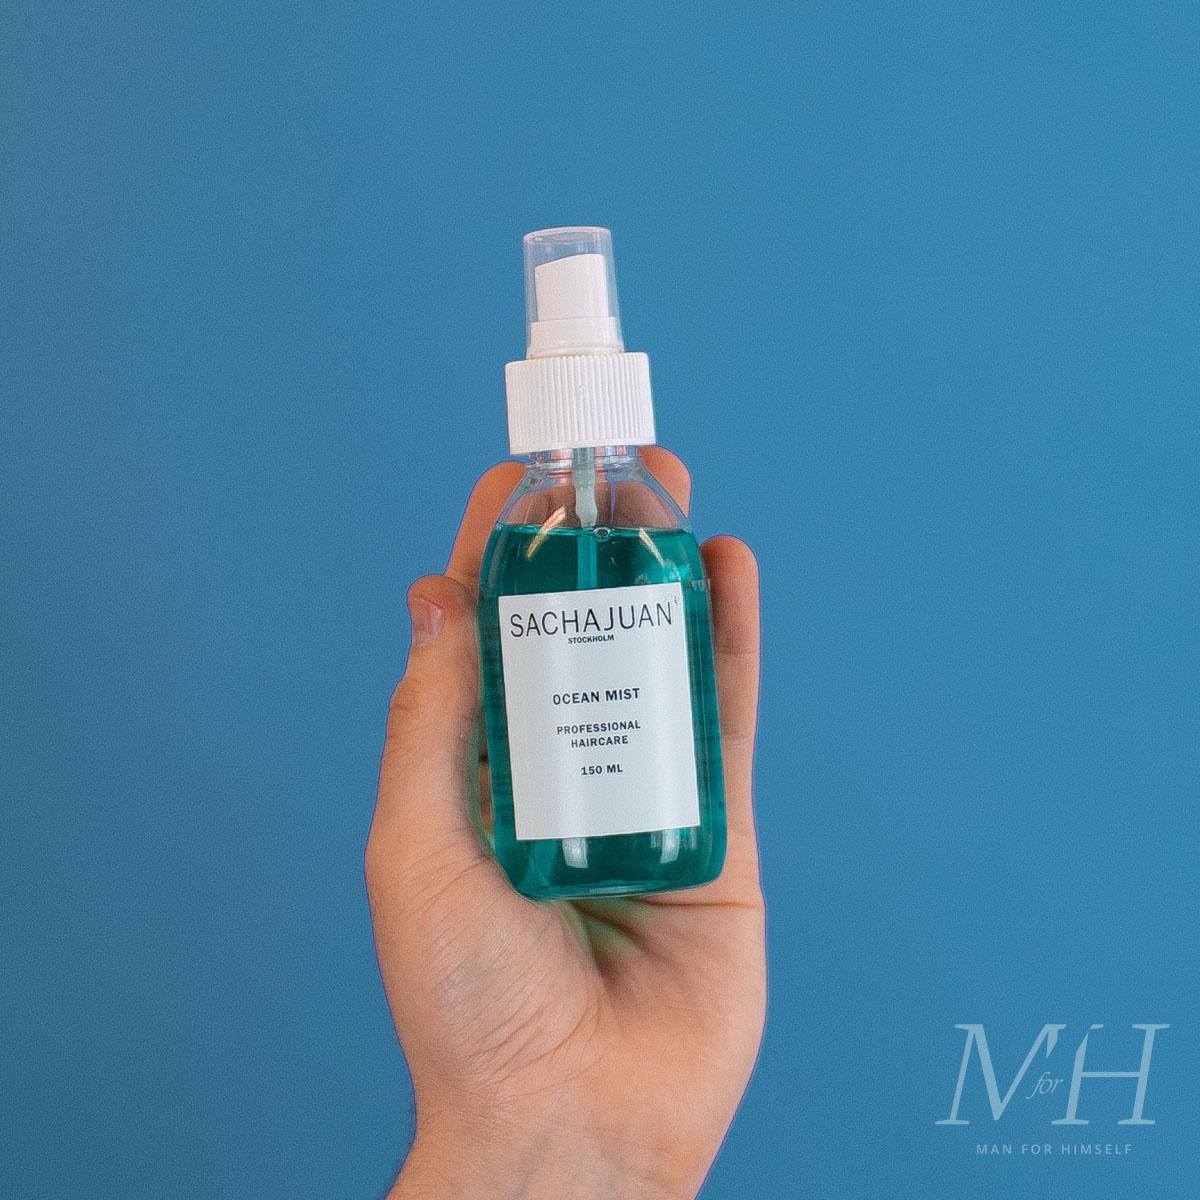 sachajuan-ocean-mist-sea-salt-spray-product-review-man-for-himself